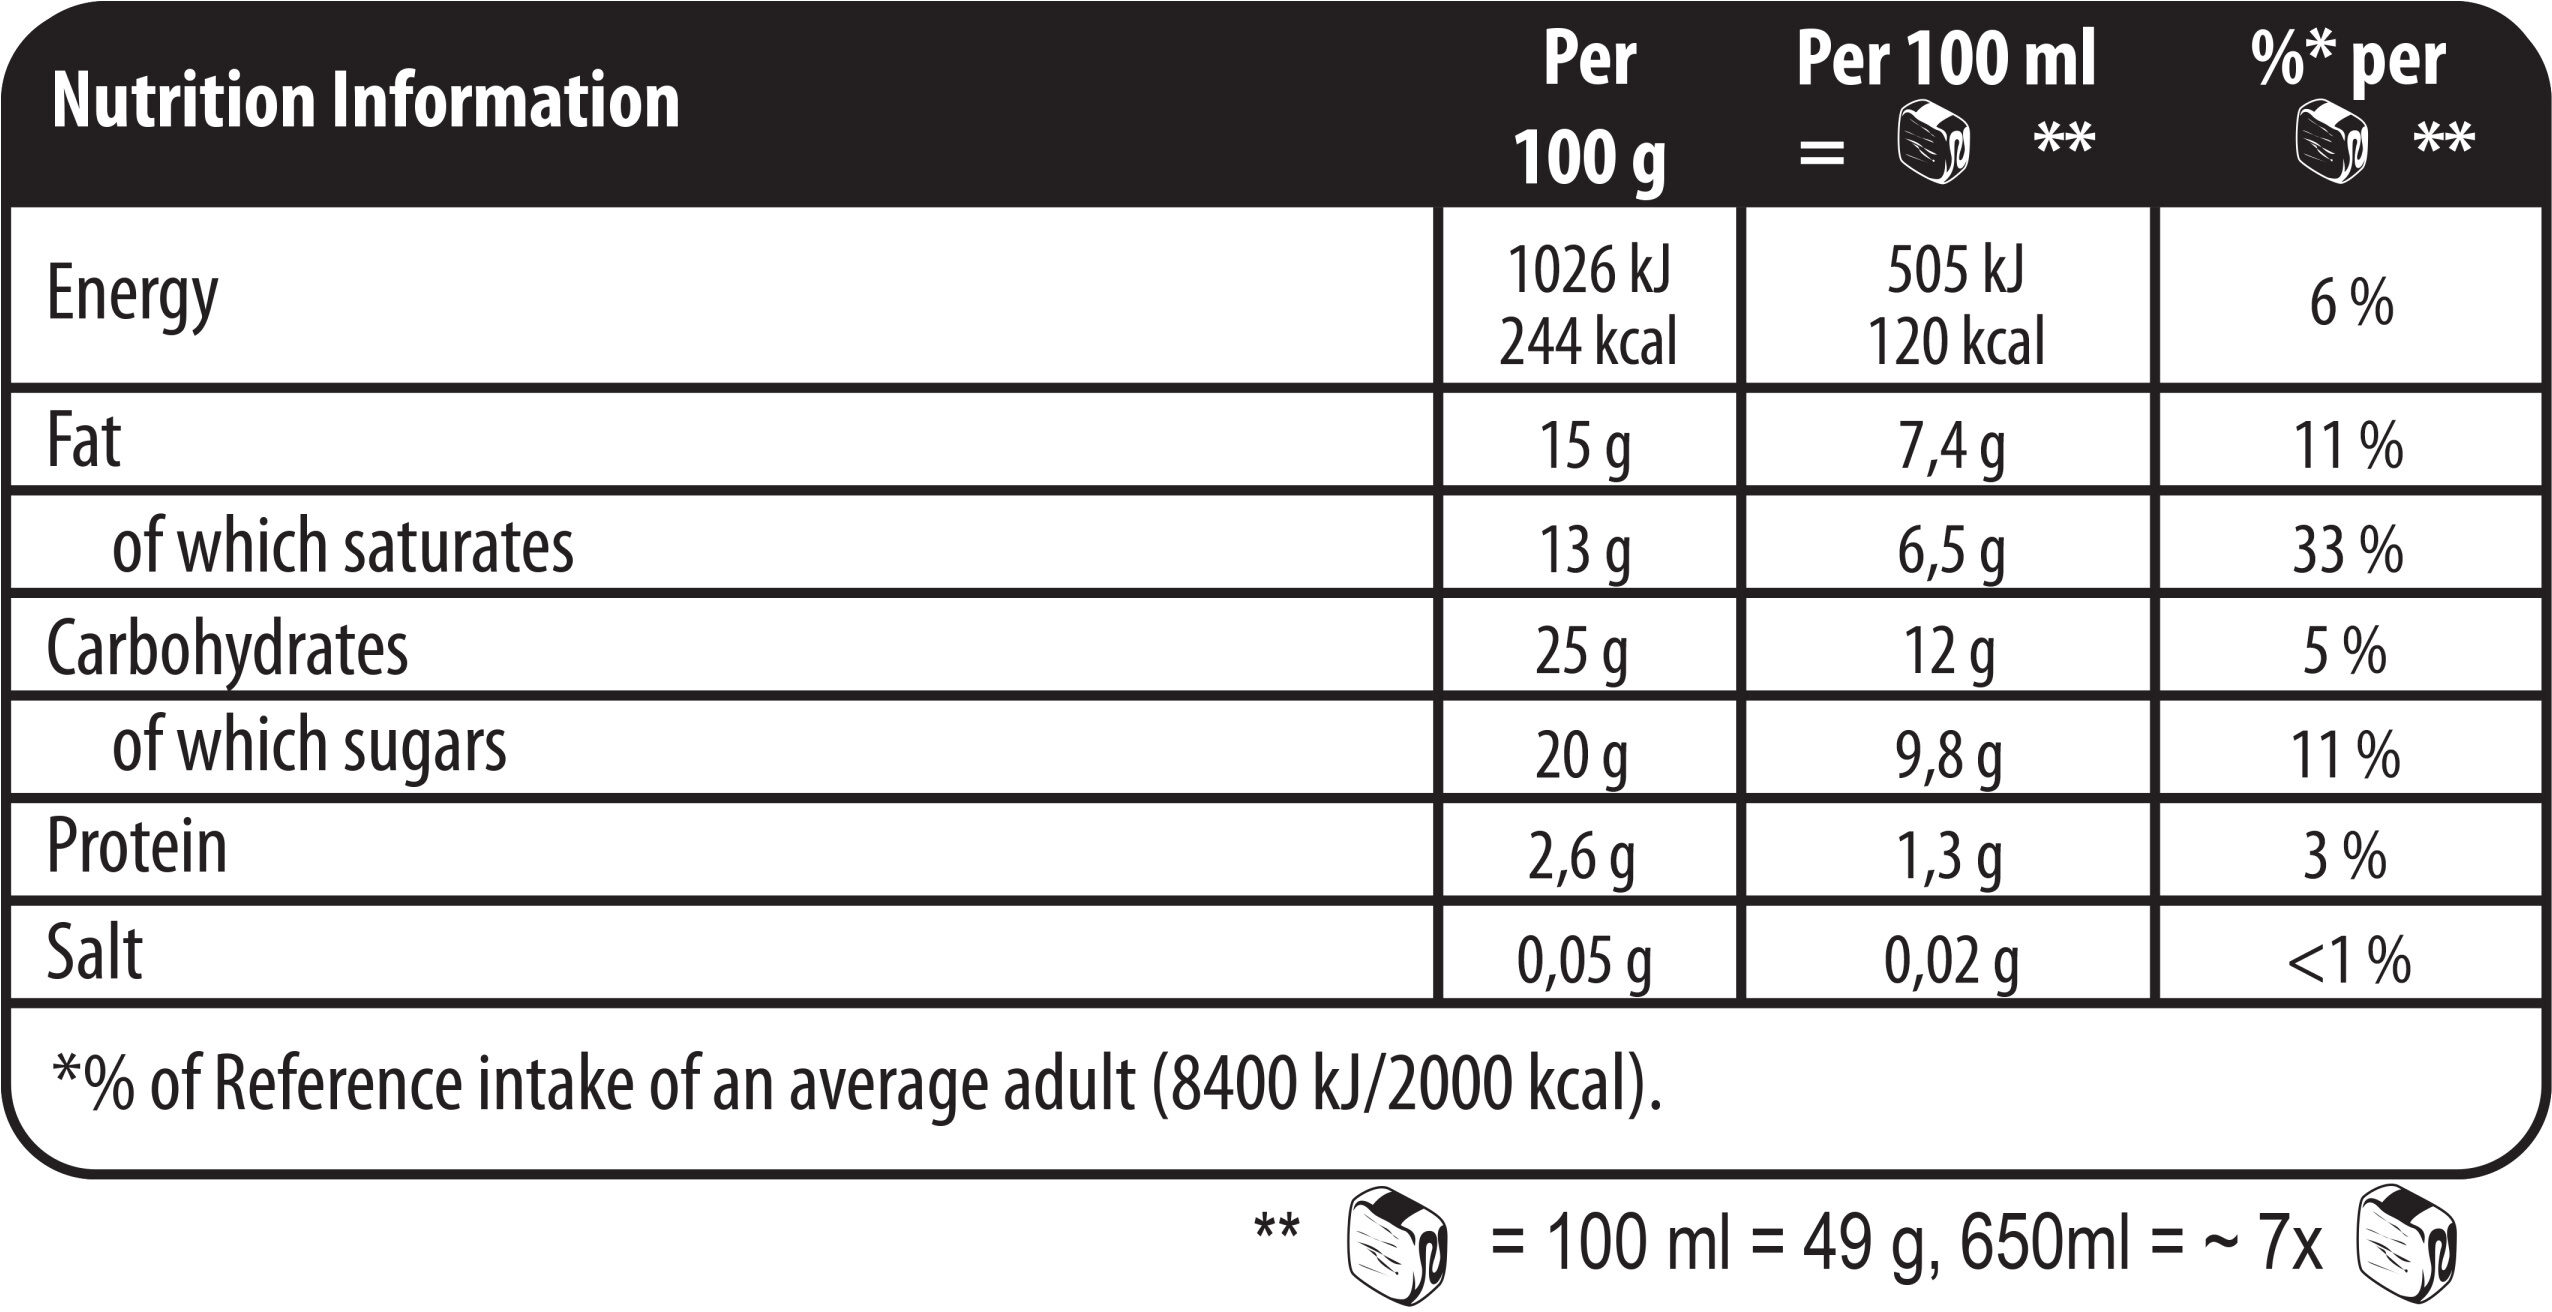 Viennetta Glace Dessert Menthe 7 parts 650ml - Nutrition facts - fr